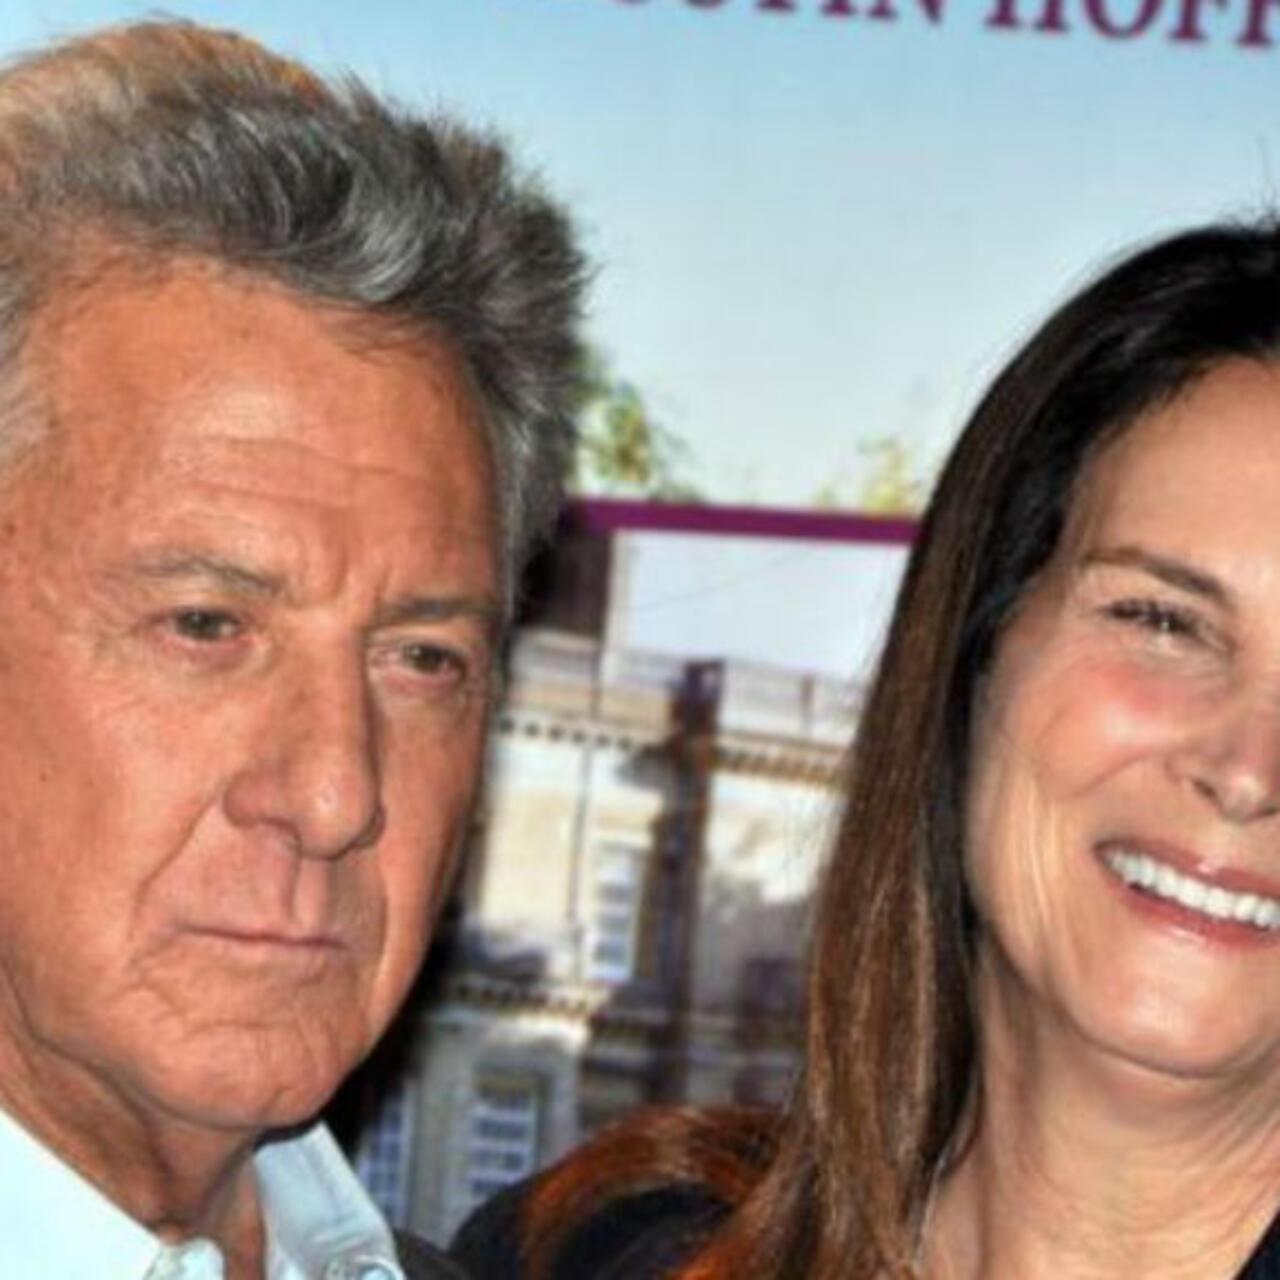 Dustin Hoffman Accused Of Exposing Himself To Teen Assaulting Two Women